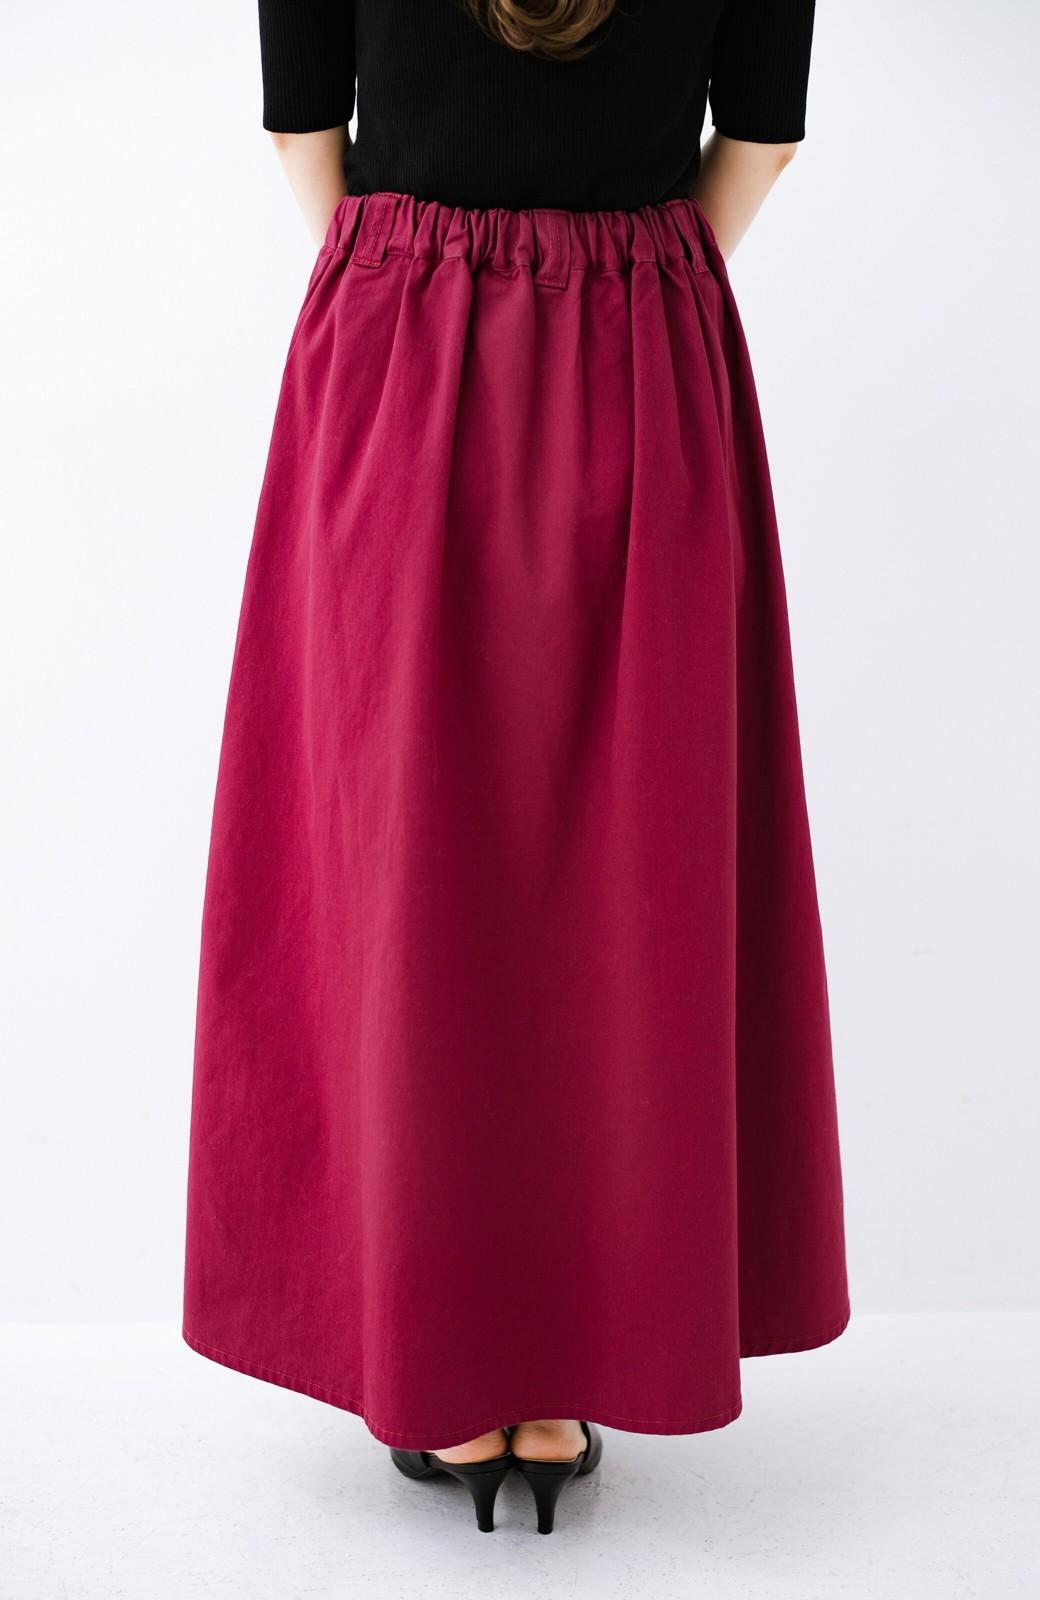 haco! ロングシーズン楽しめる タックボリュームのチノロングスカート <パープル>の商品写真6